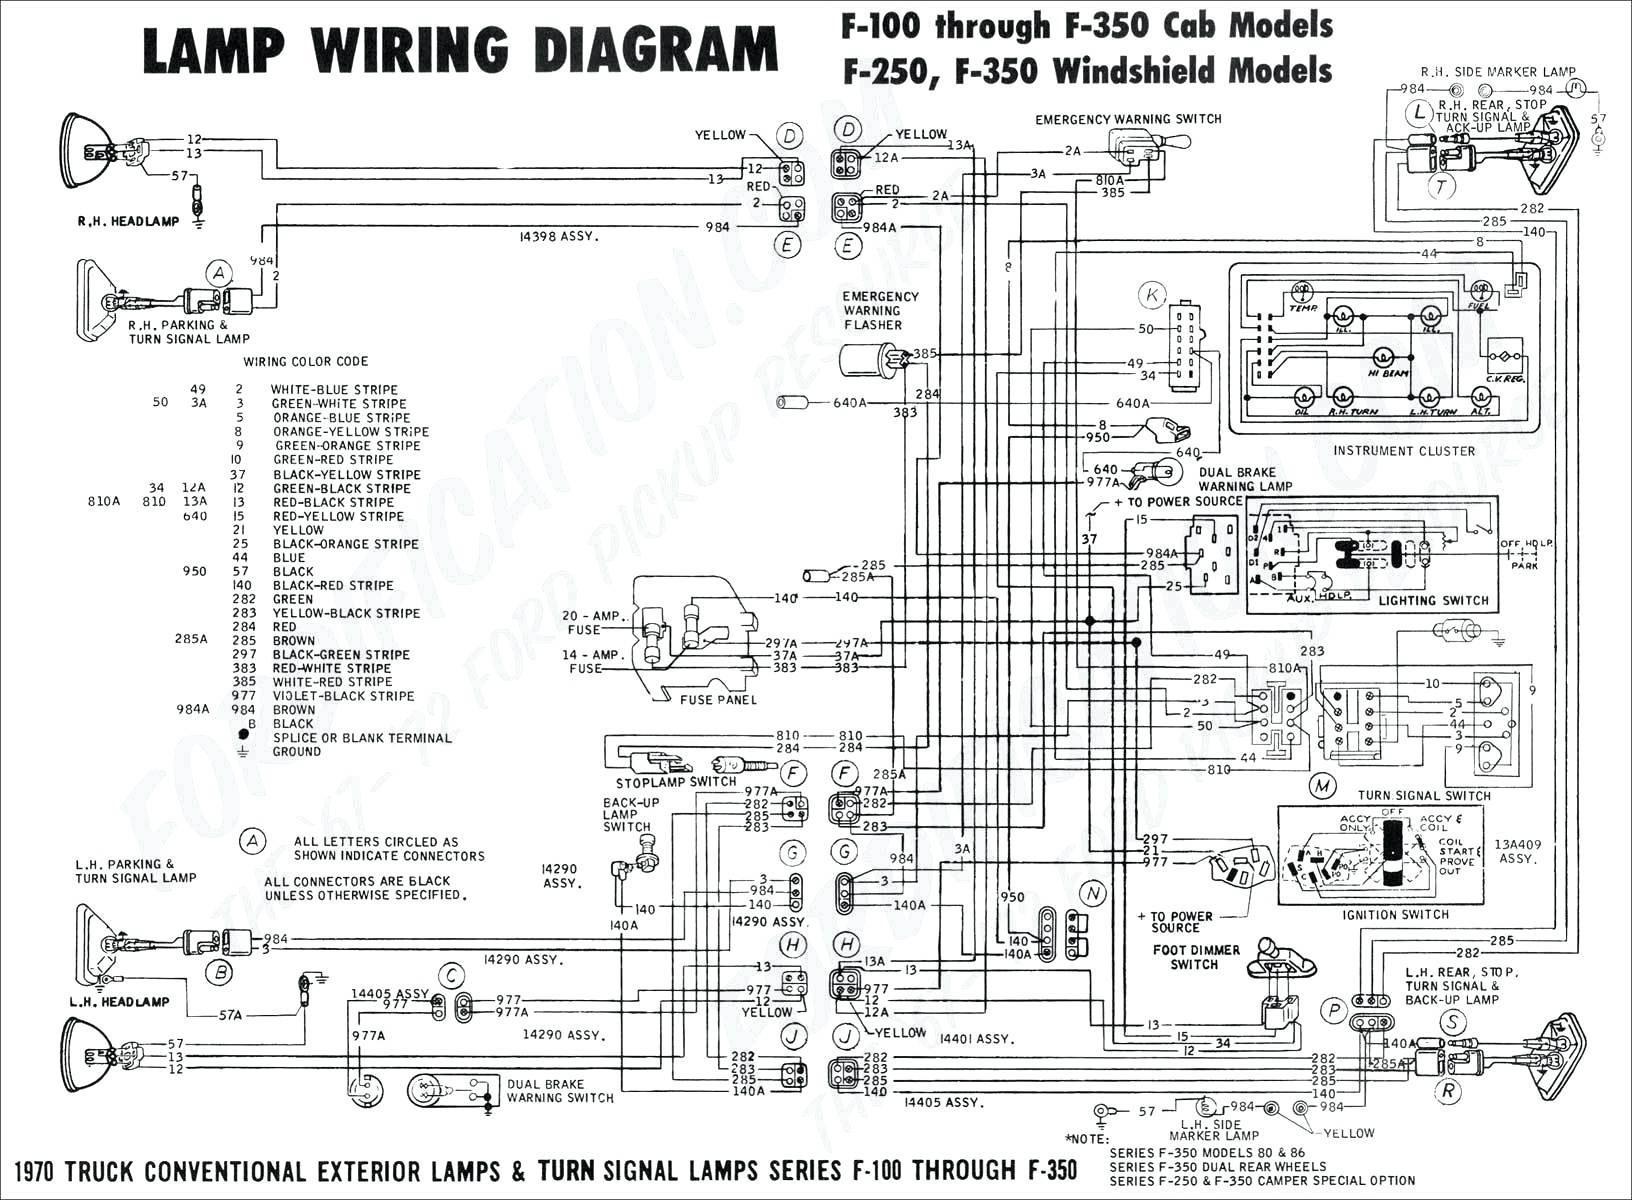 Wiring Diagram 2000 Chevy S10 Rear End Wiring Diagram Load 2000 Blazer Lighting Wiring Diagram